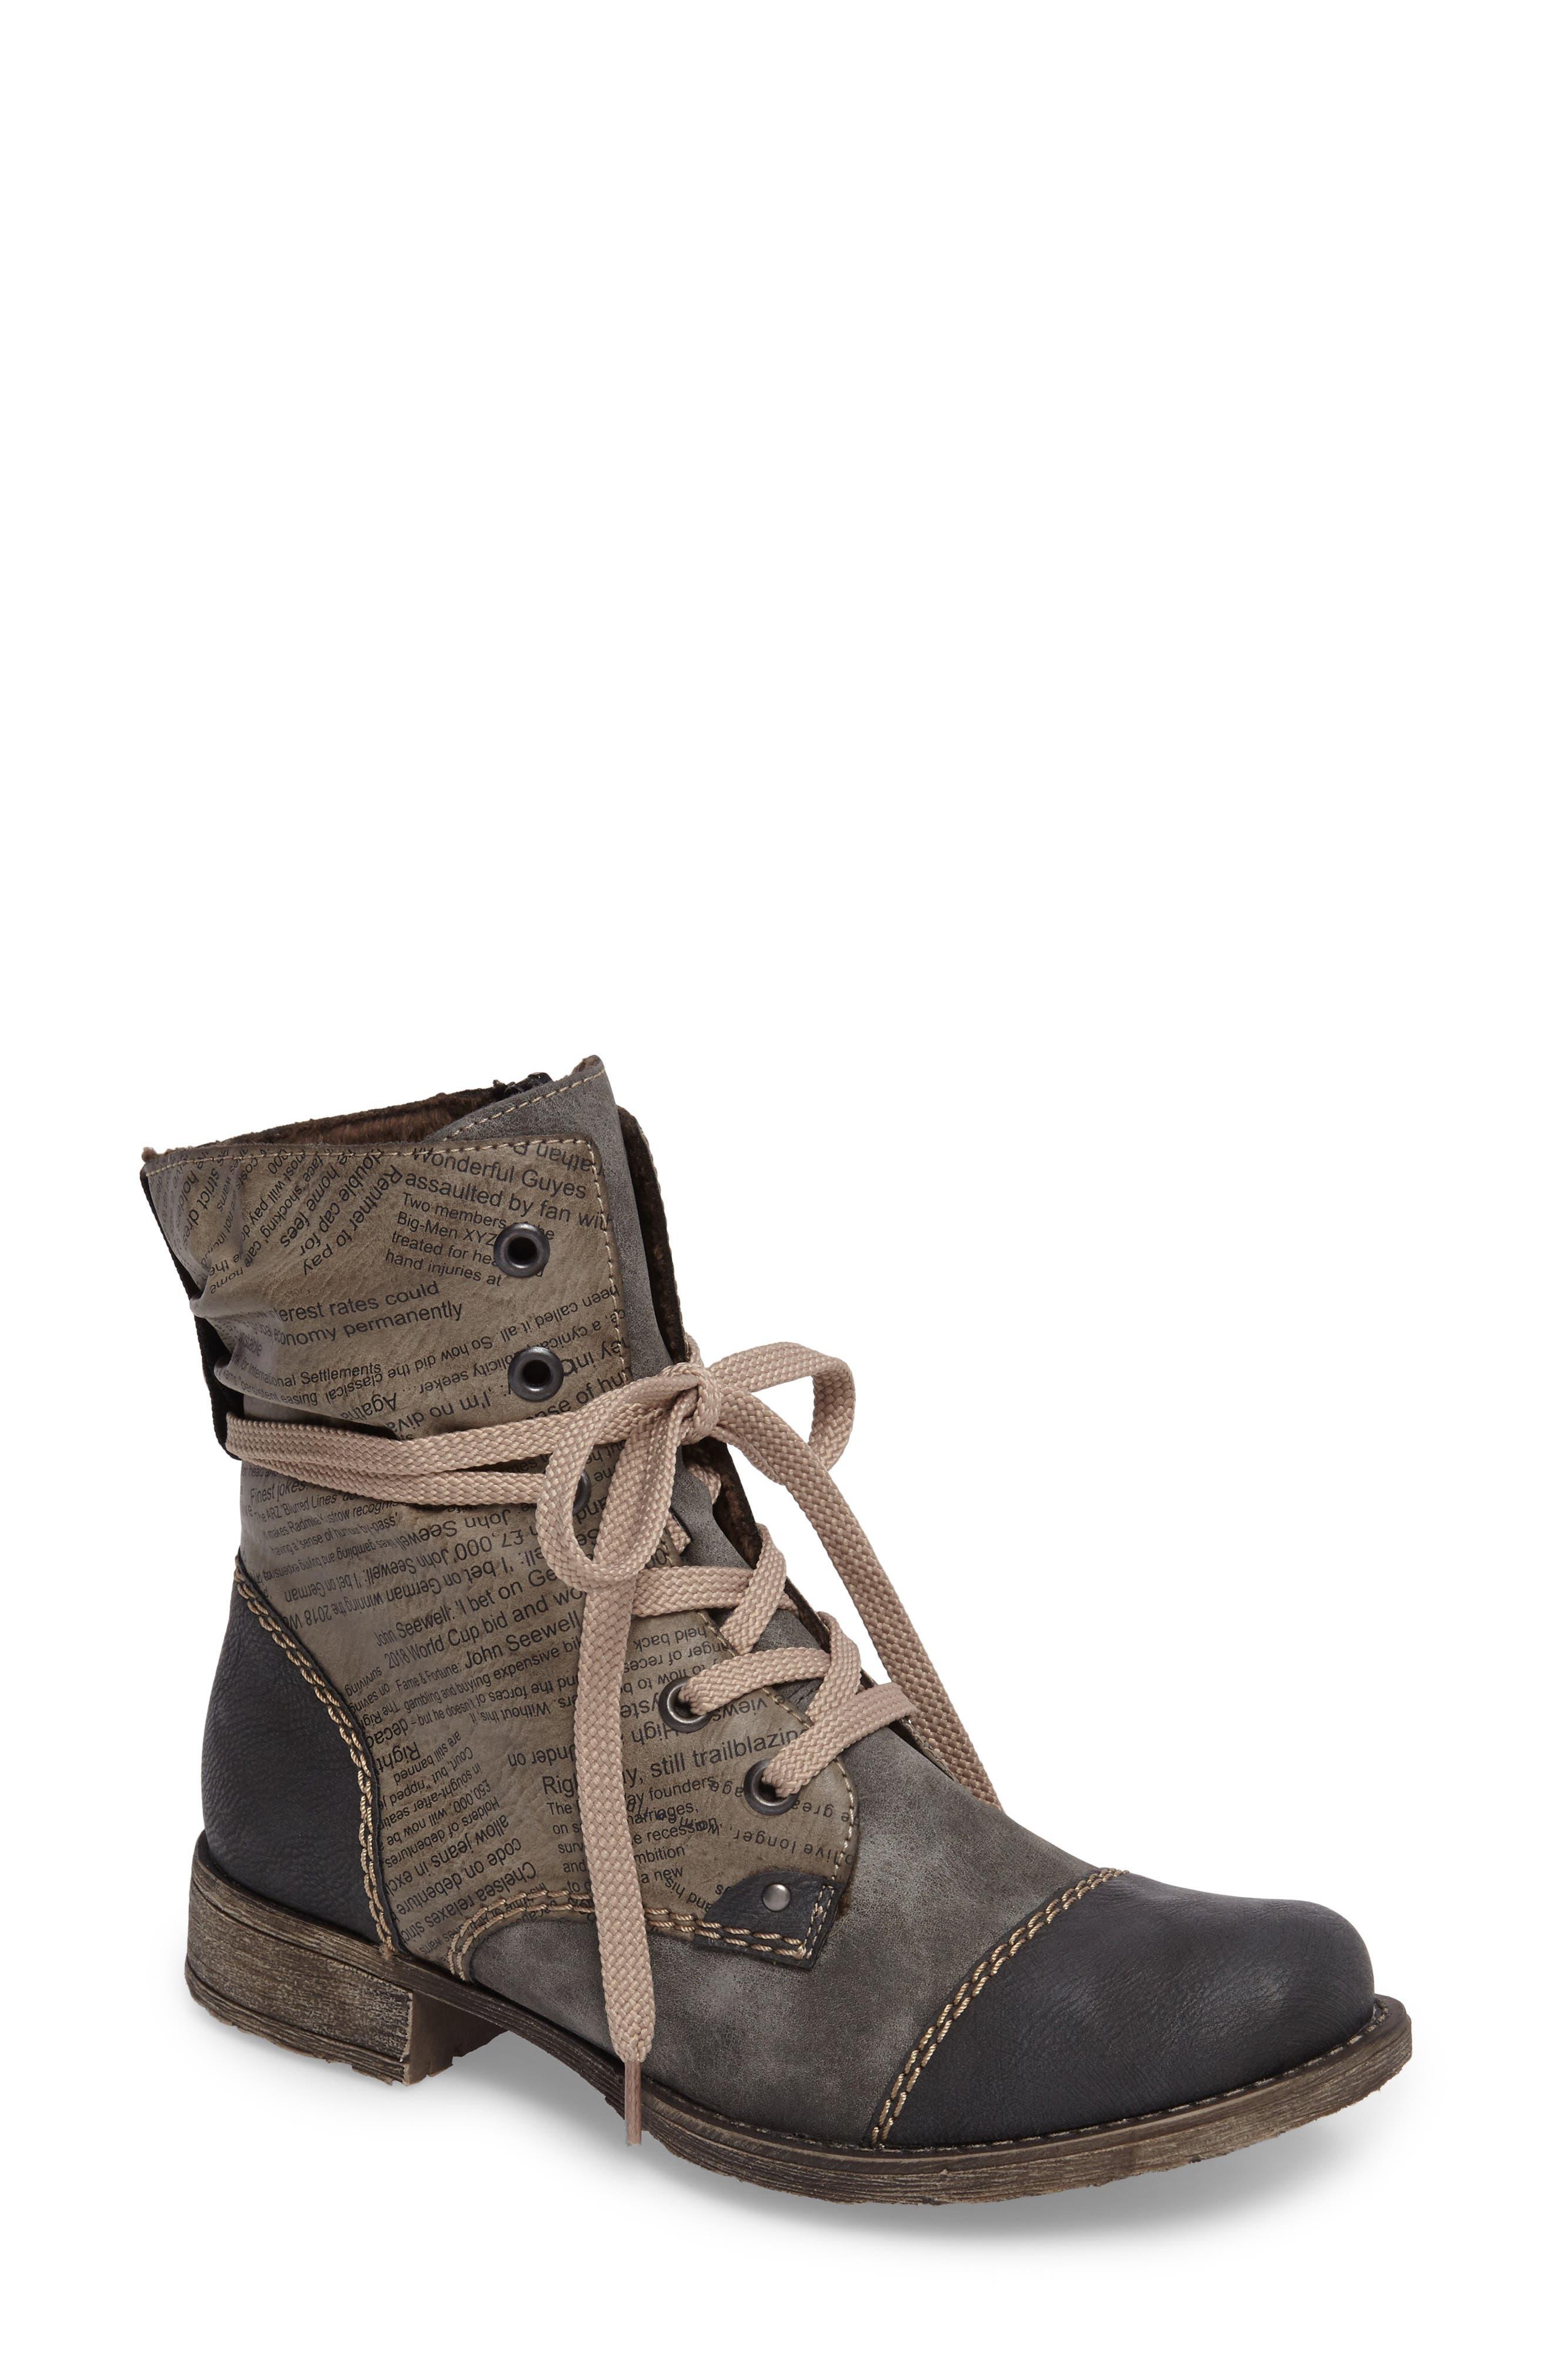 Women's Rieker Antistress Shoes | Nordstrom